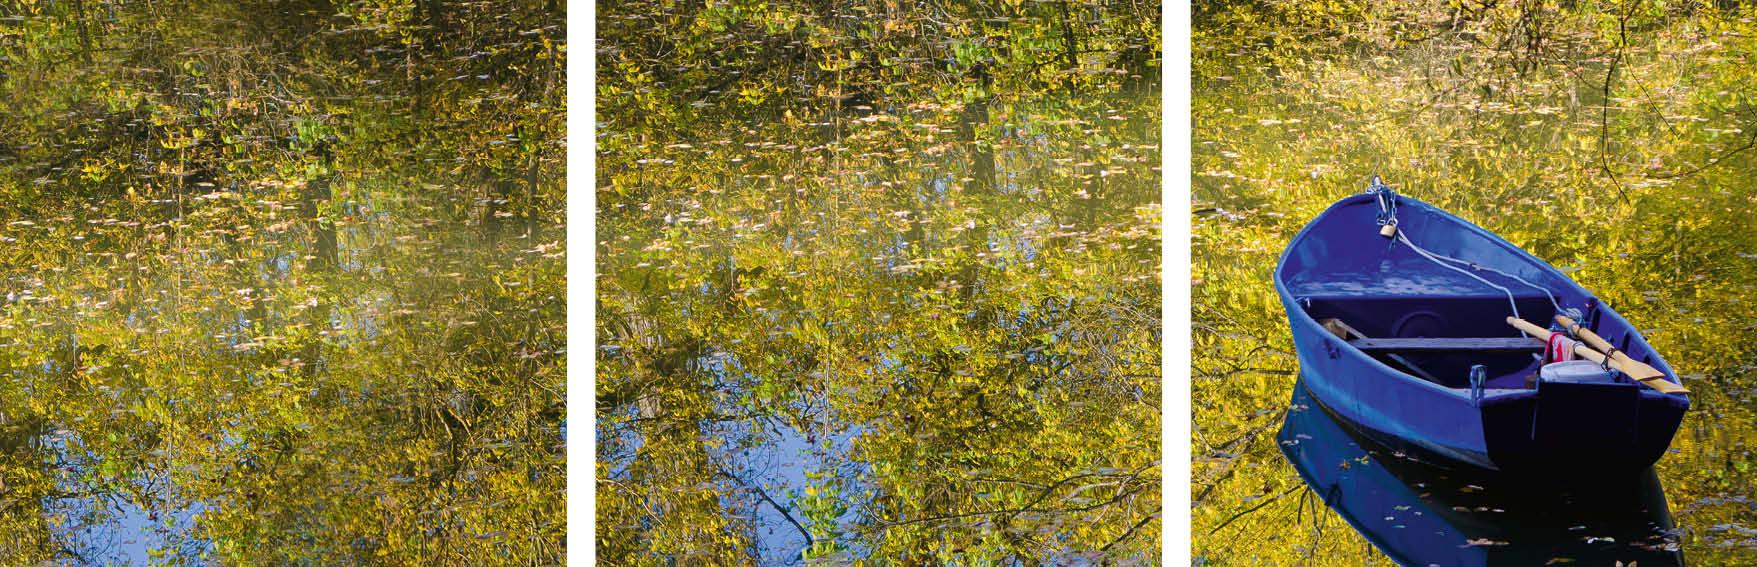 Herbst – Roman Pretot, Serien-Nr.: 361-009